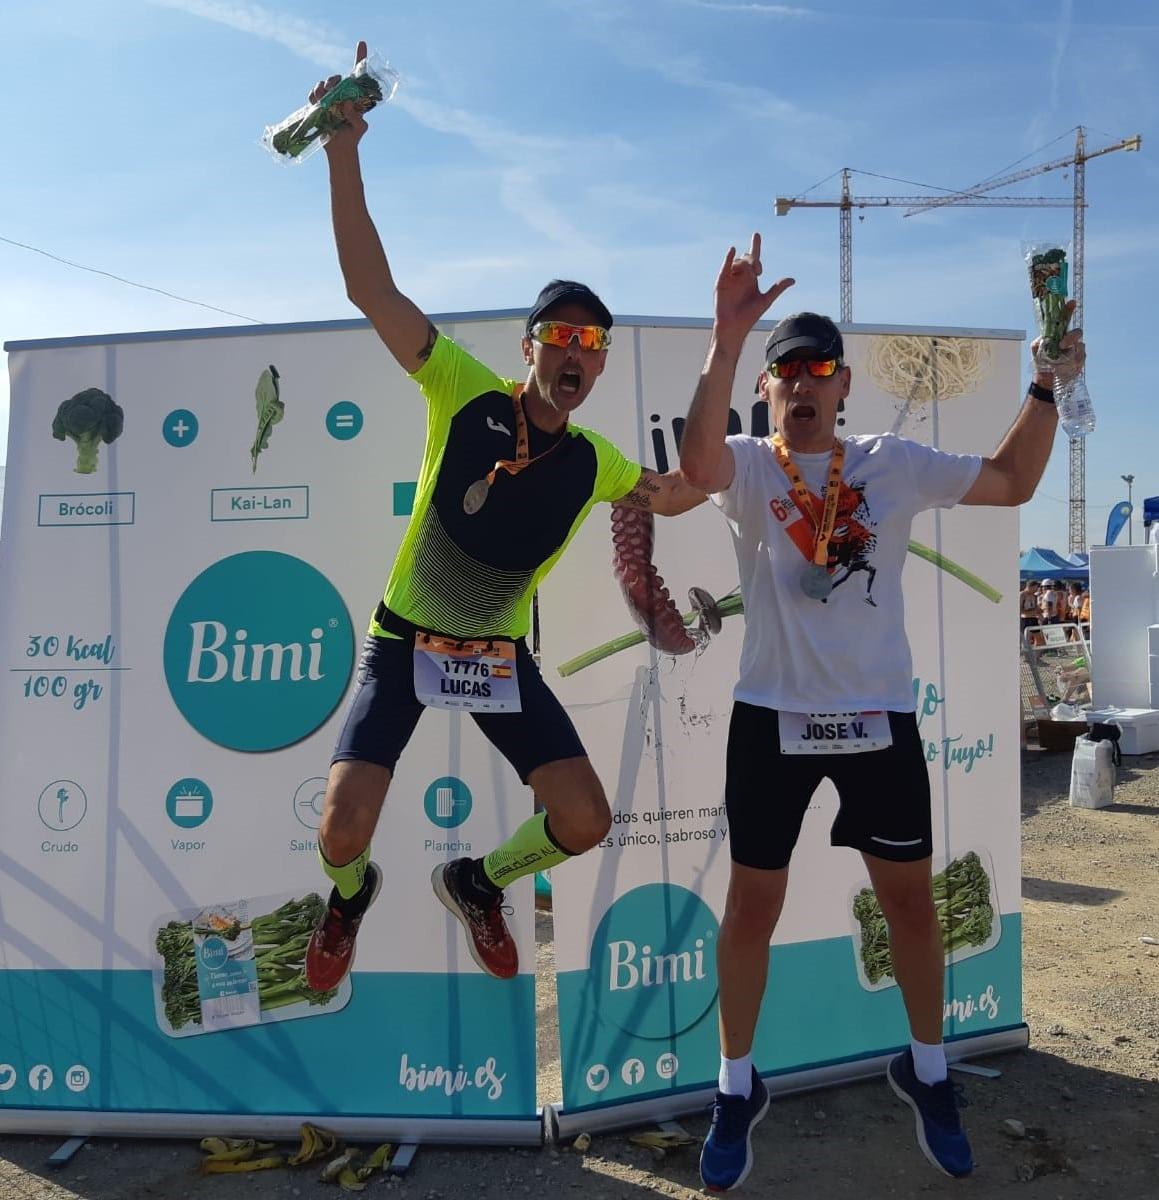 Bimi - Producto oficial Maratón Valencia